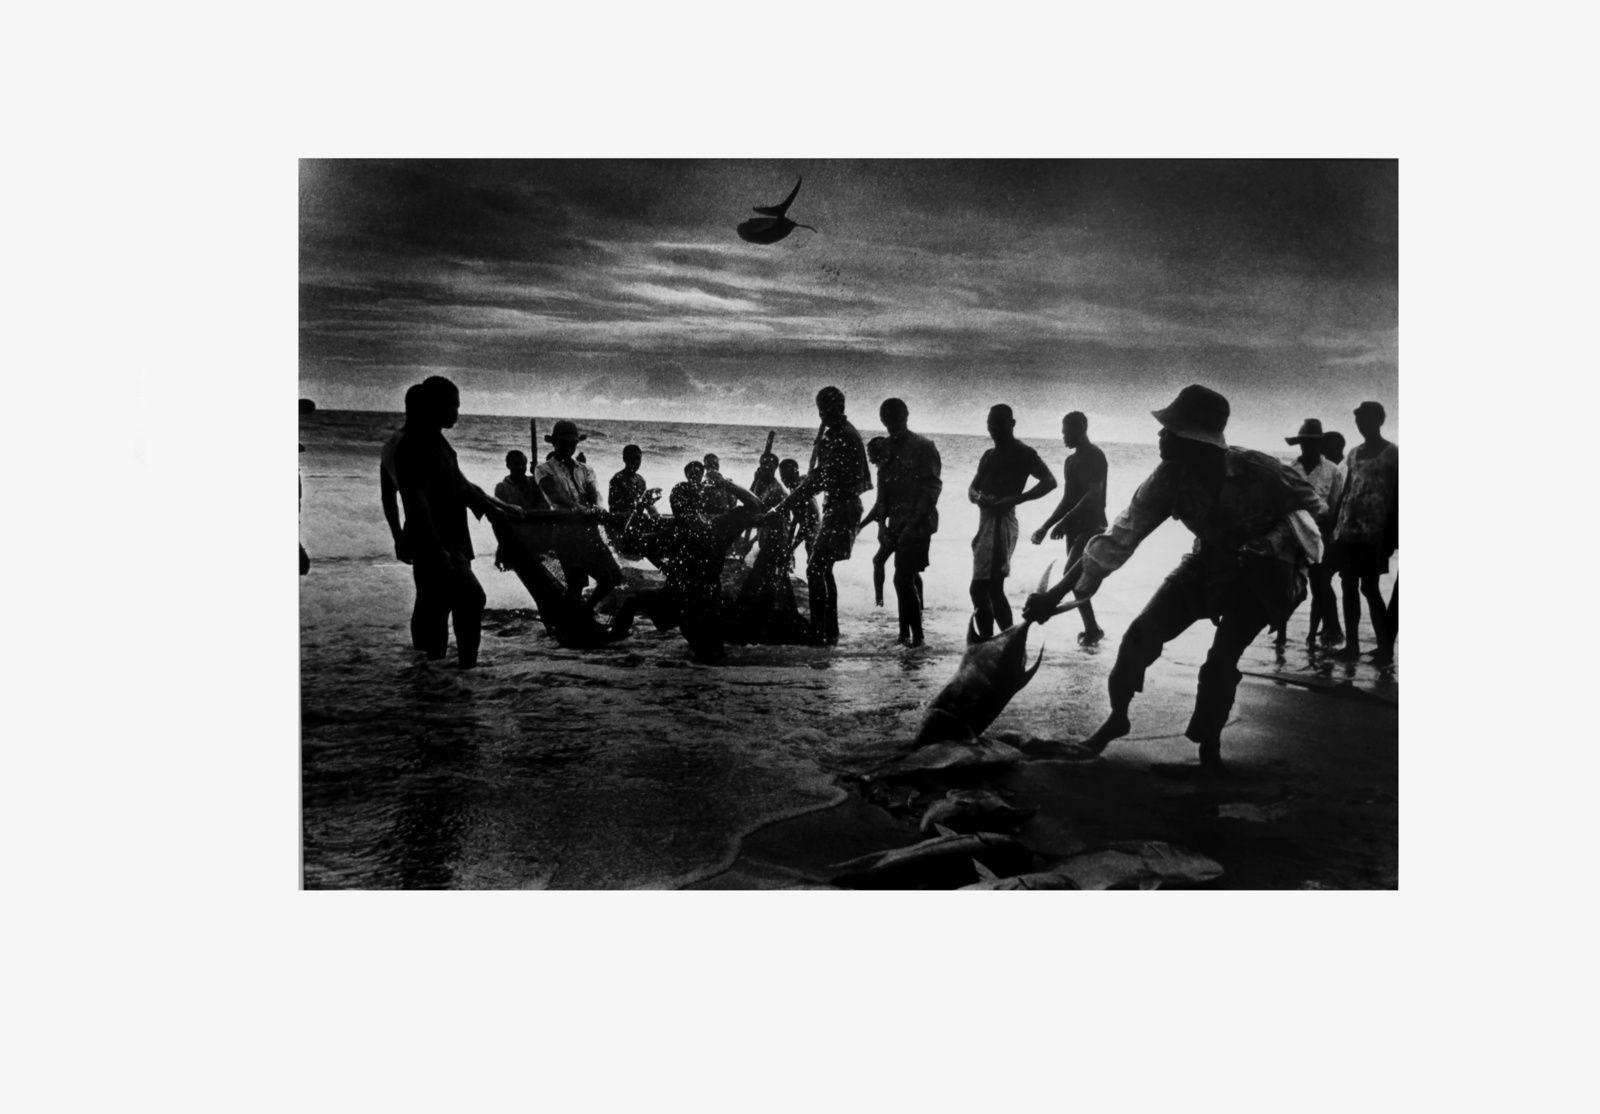 """Pêcheurs, Freetown, Sierra Leone"", 1959 de Ed VAN DER ELSKEN - Courtesy Leiden University Librairies © Photo Éric Simon"